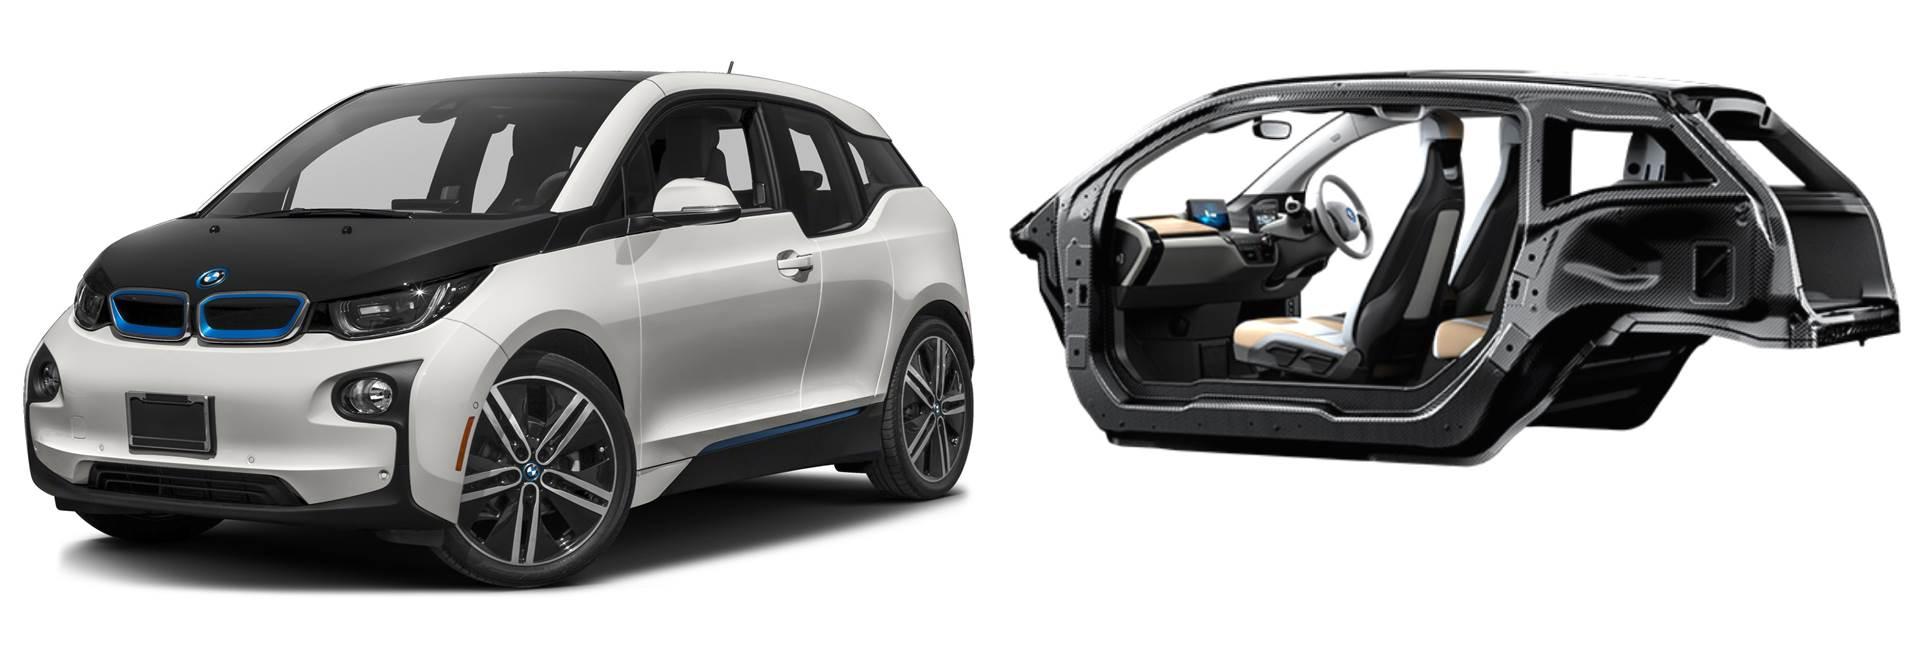 4-BMW i3 Series body.jpg